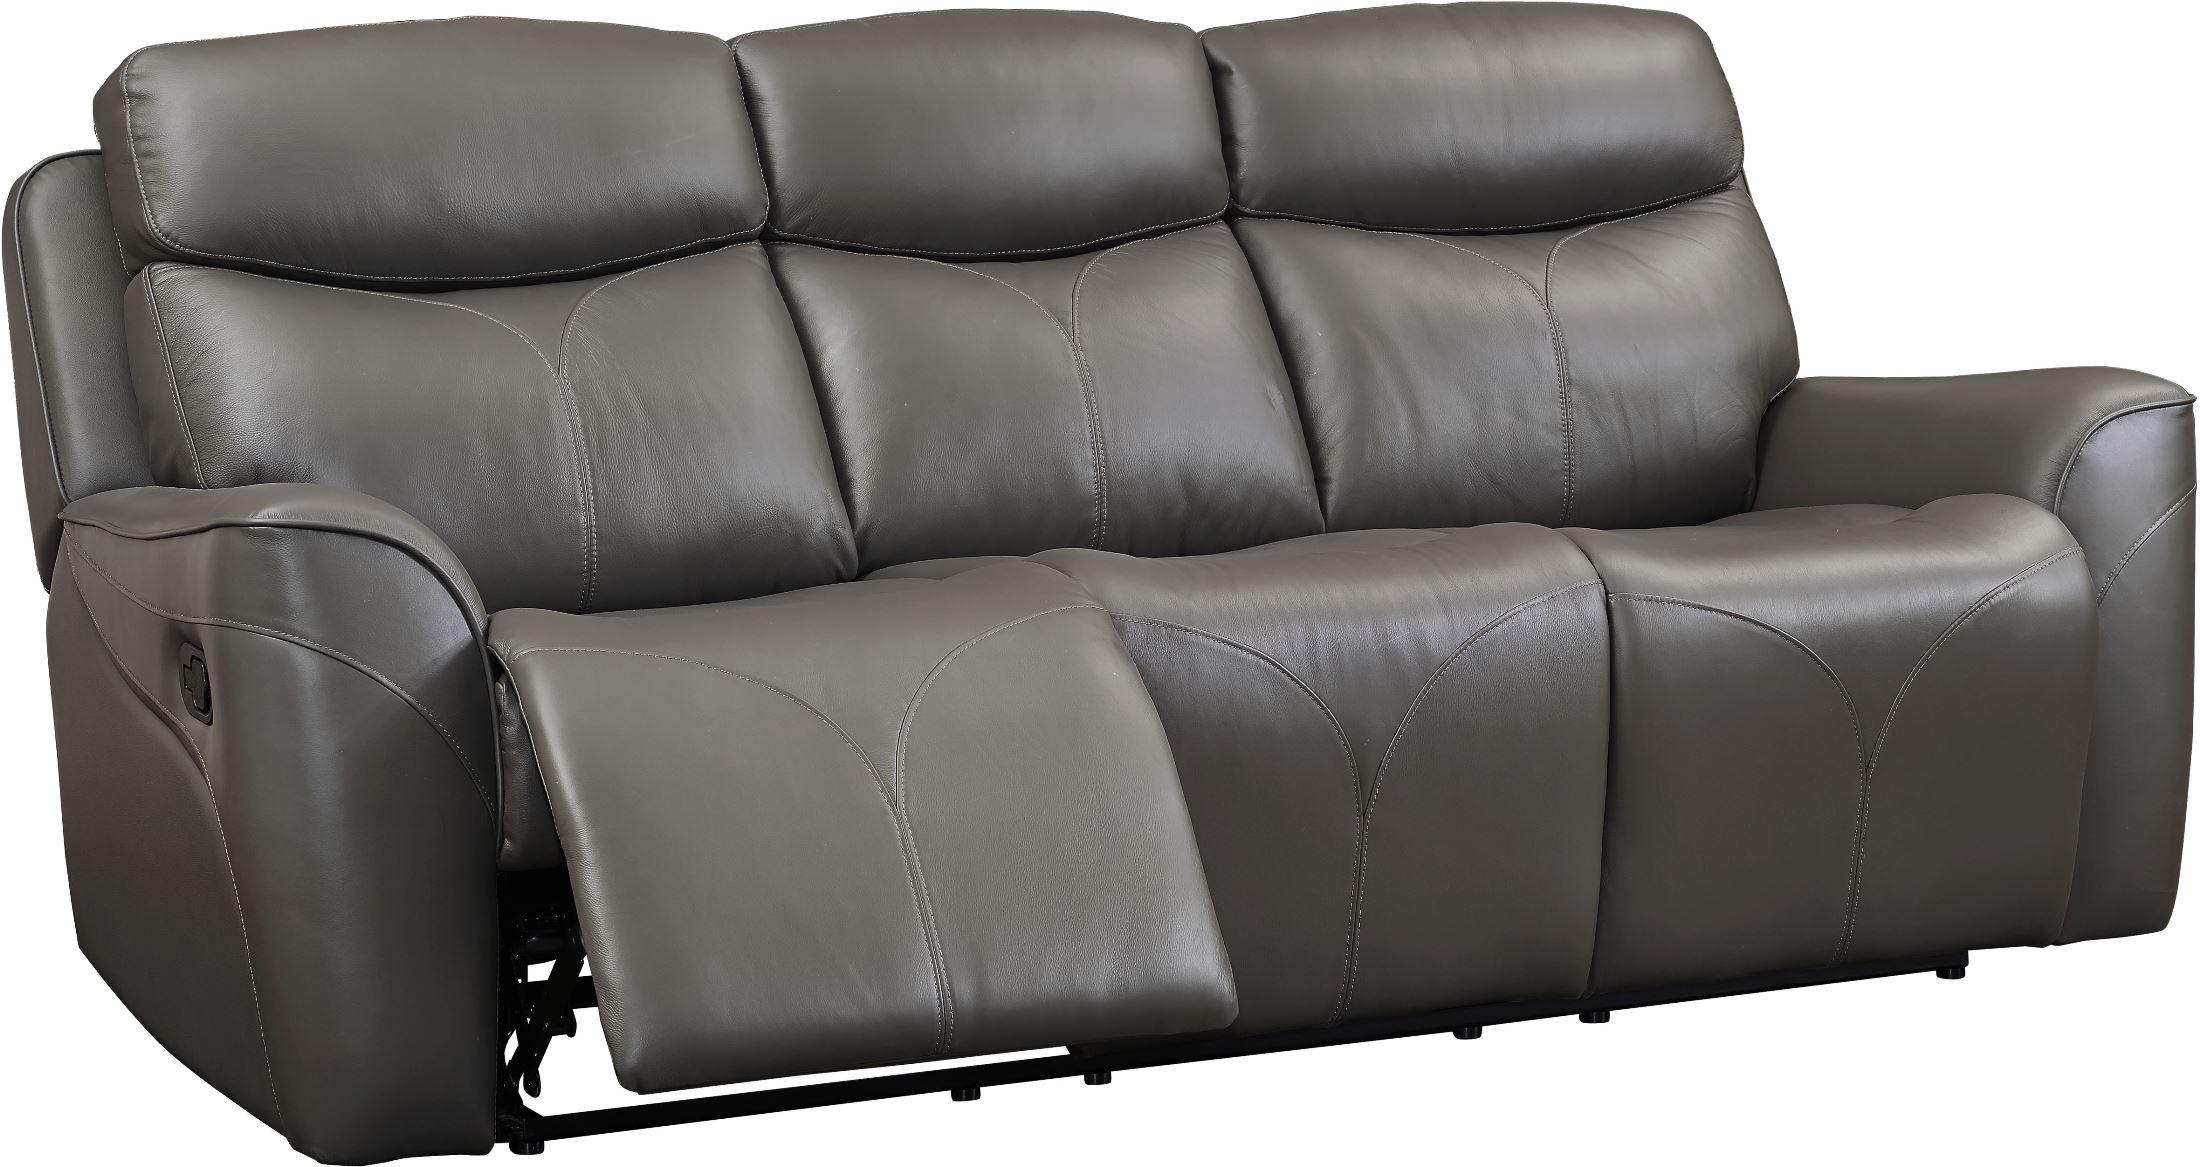 Roxbury Gray Leather Power Dual Reclining Sofa